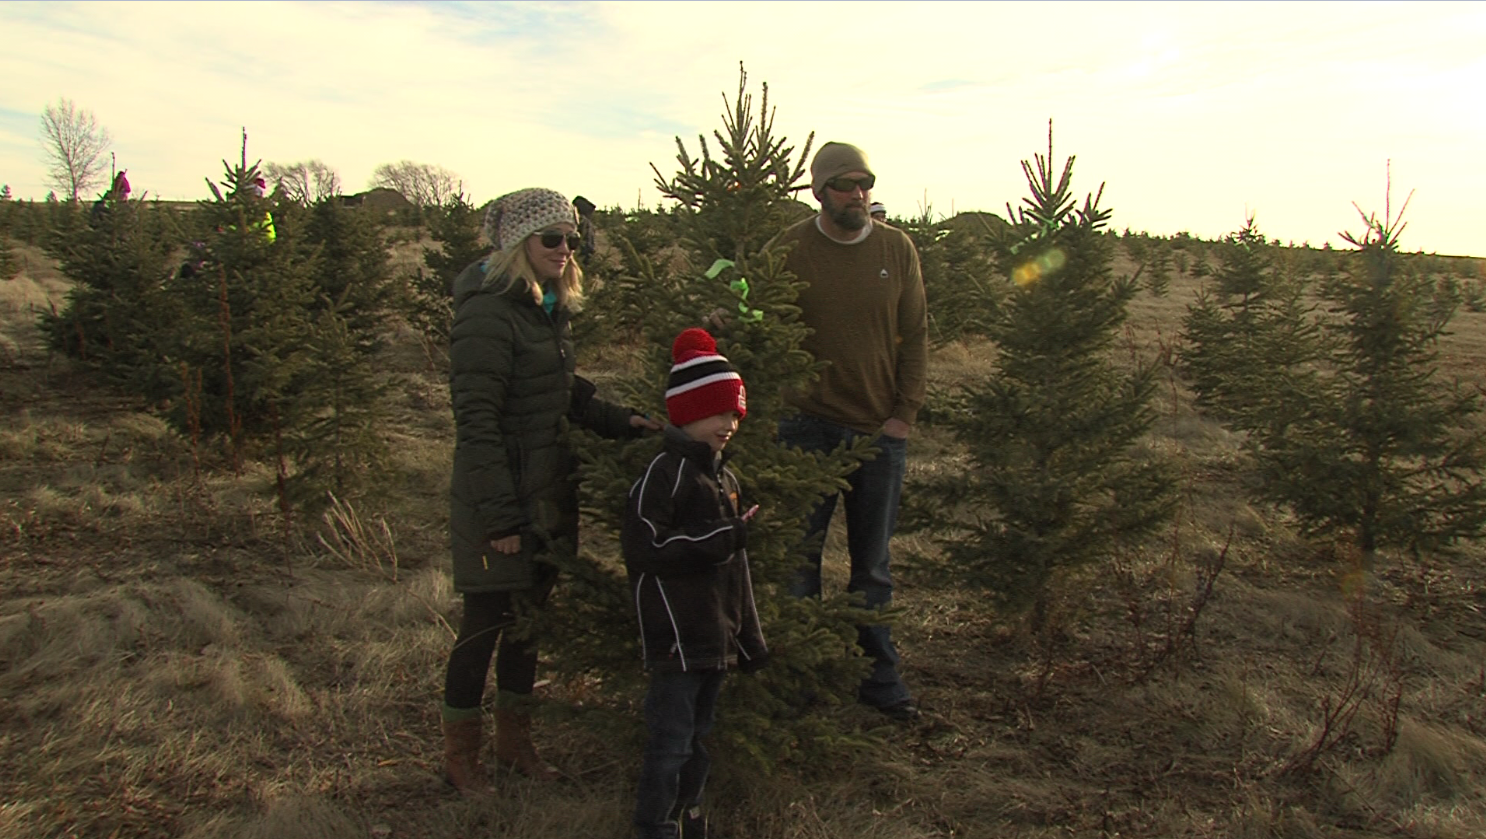 U Cut Christmas Trees.U Cut Christmas Tree Farm Opens To Create New Family